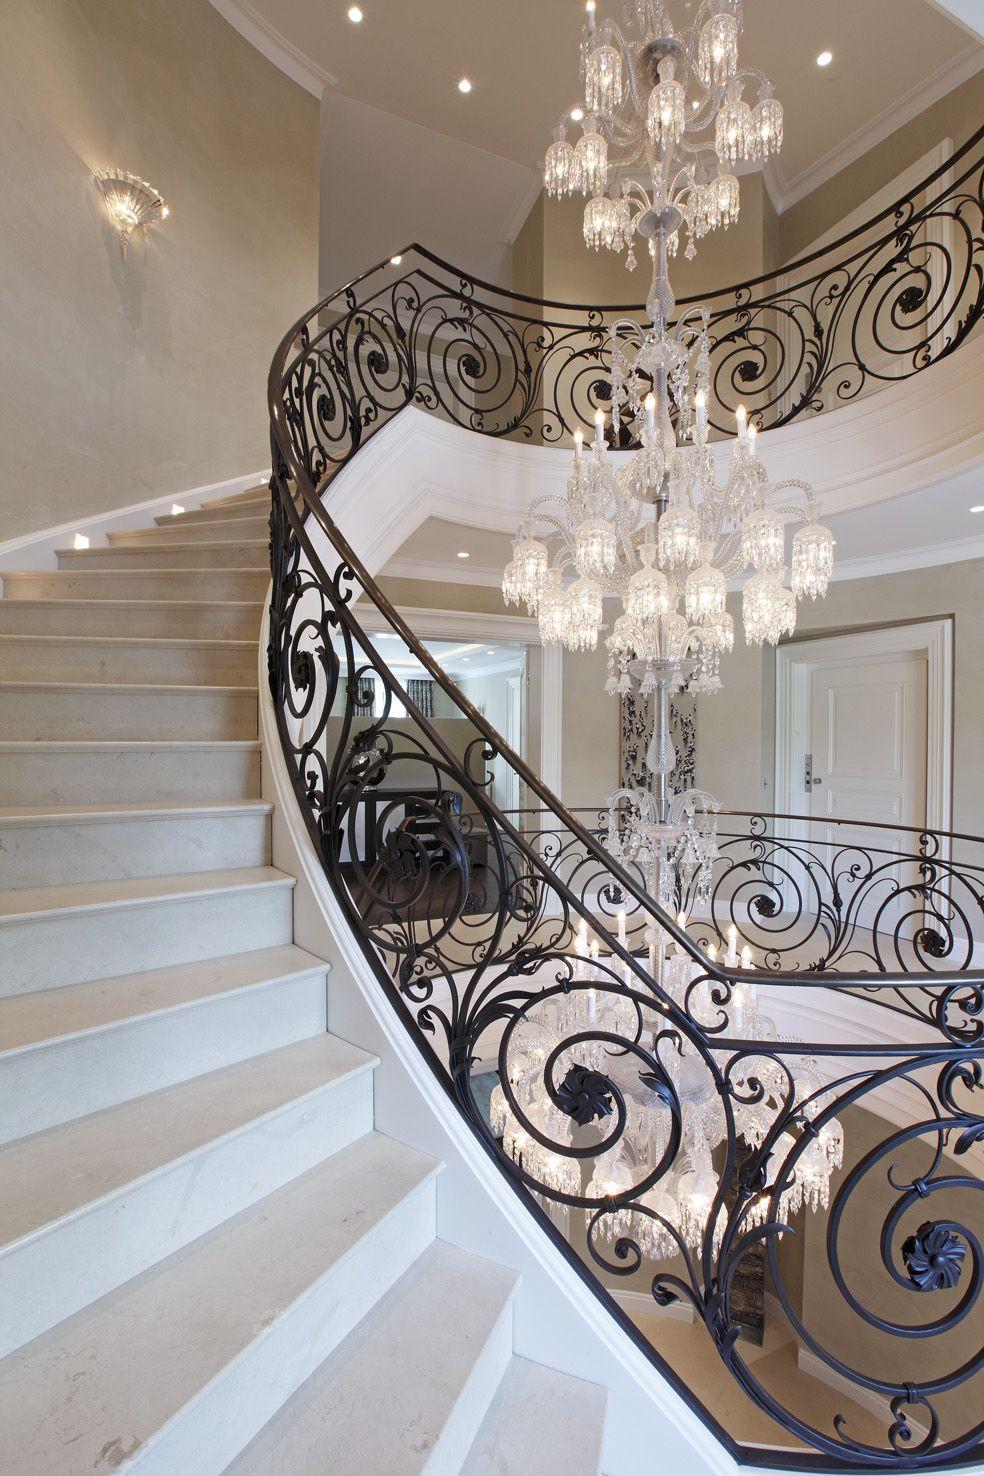 Lighting Basement Washroom Stairs: Baccarat Chandelier Villa Privée...stunning Wrought Iron